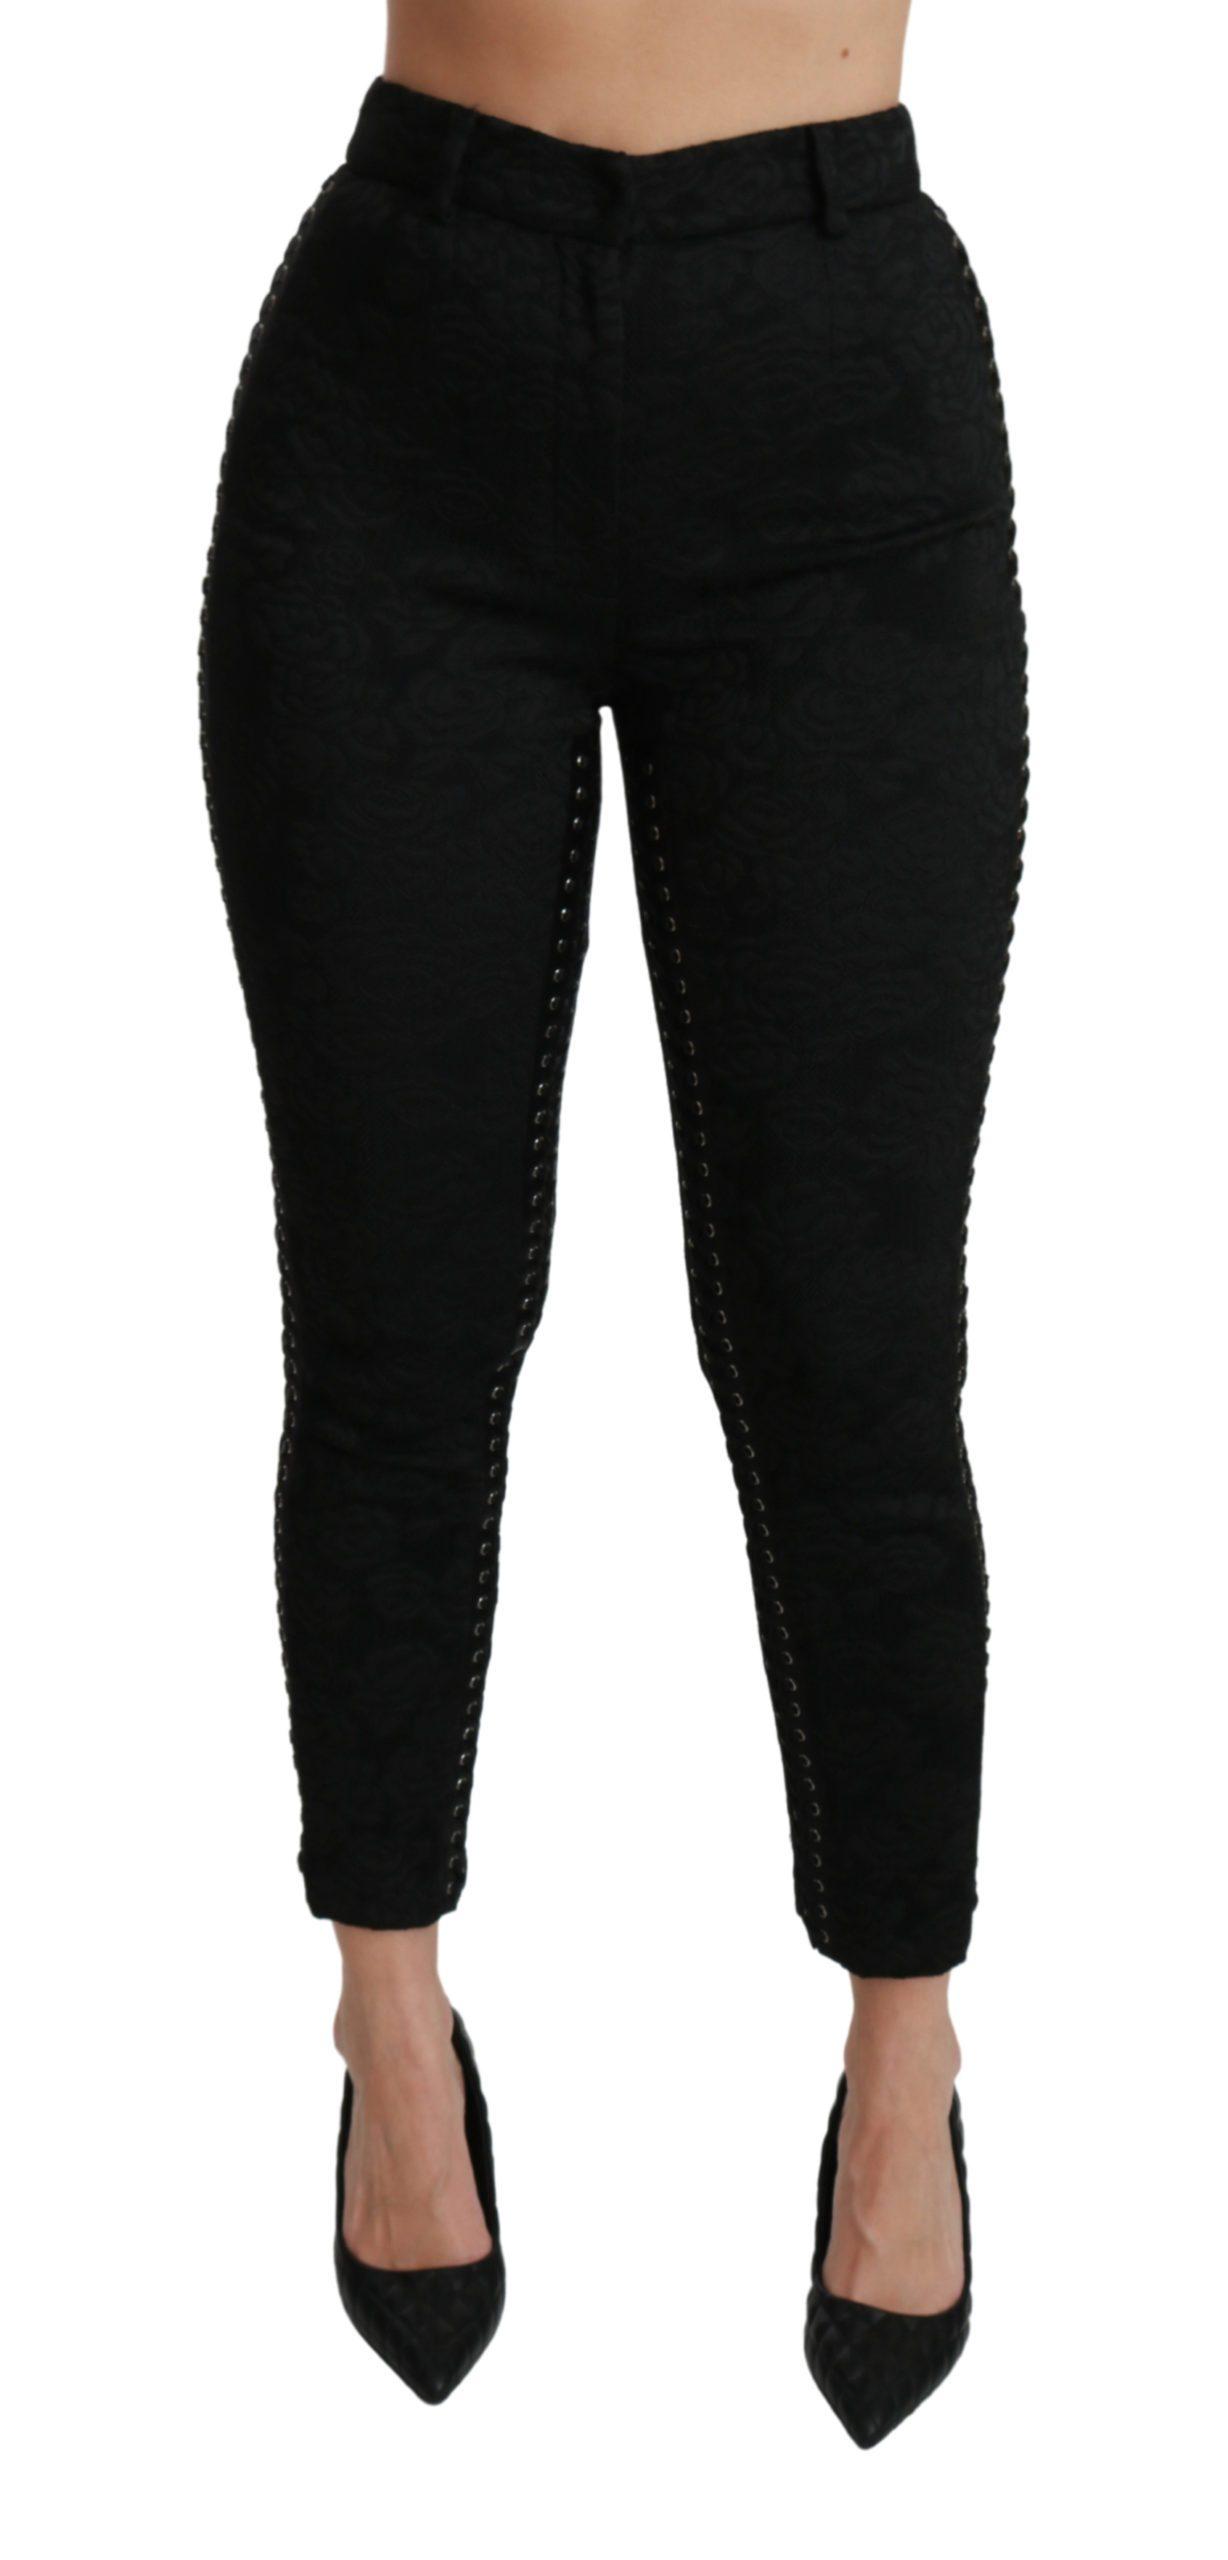 Dolce & Gabbana Women's Brocade Skinny High Waist Trouser Black PAN70942 - IT40|S